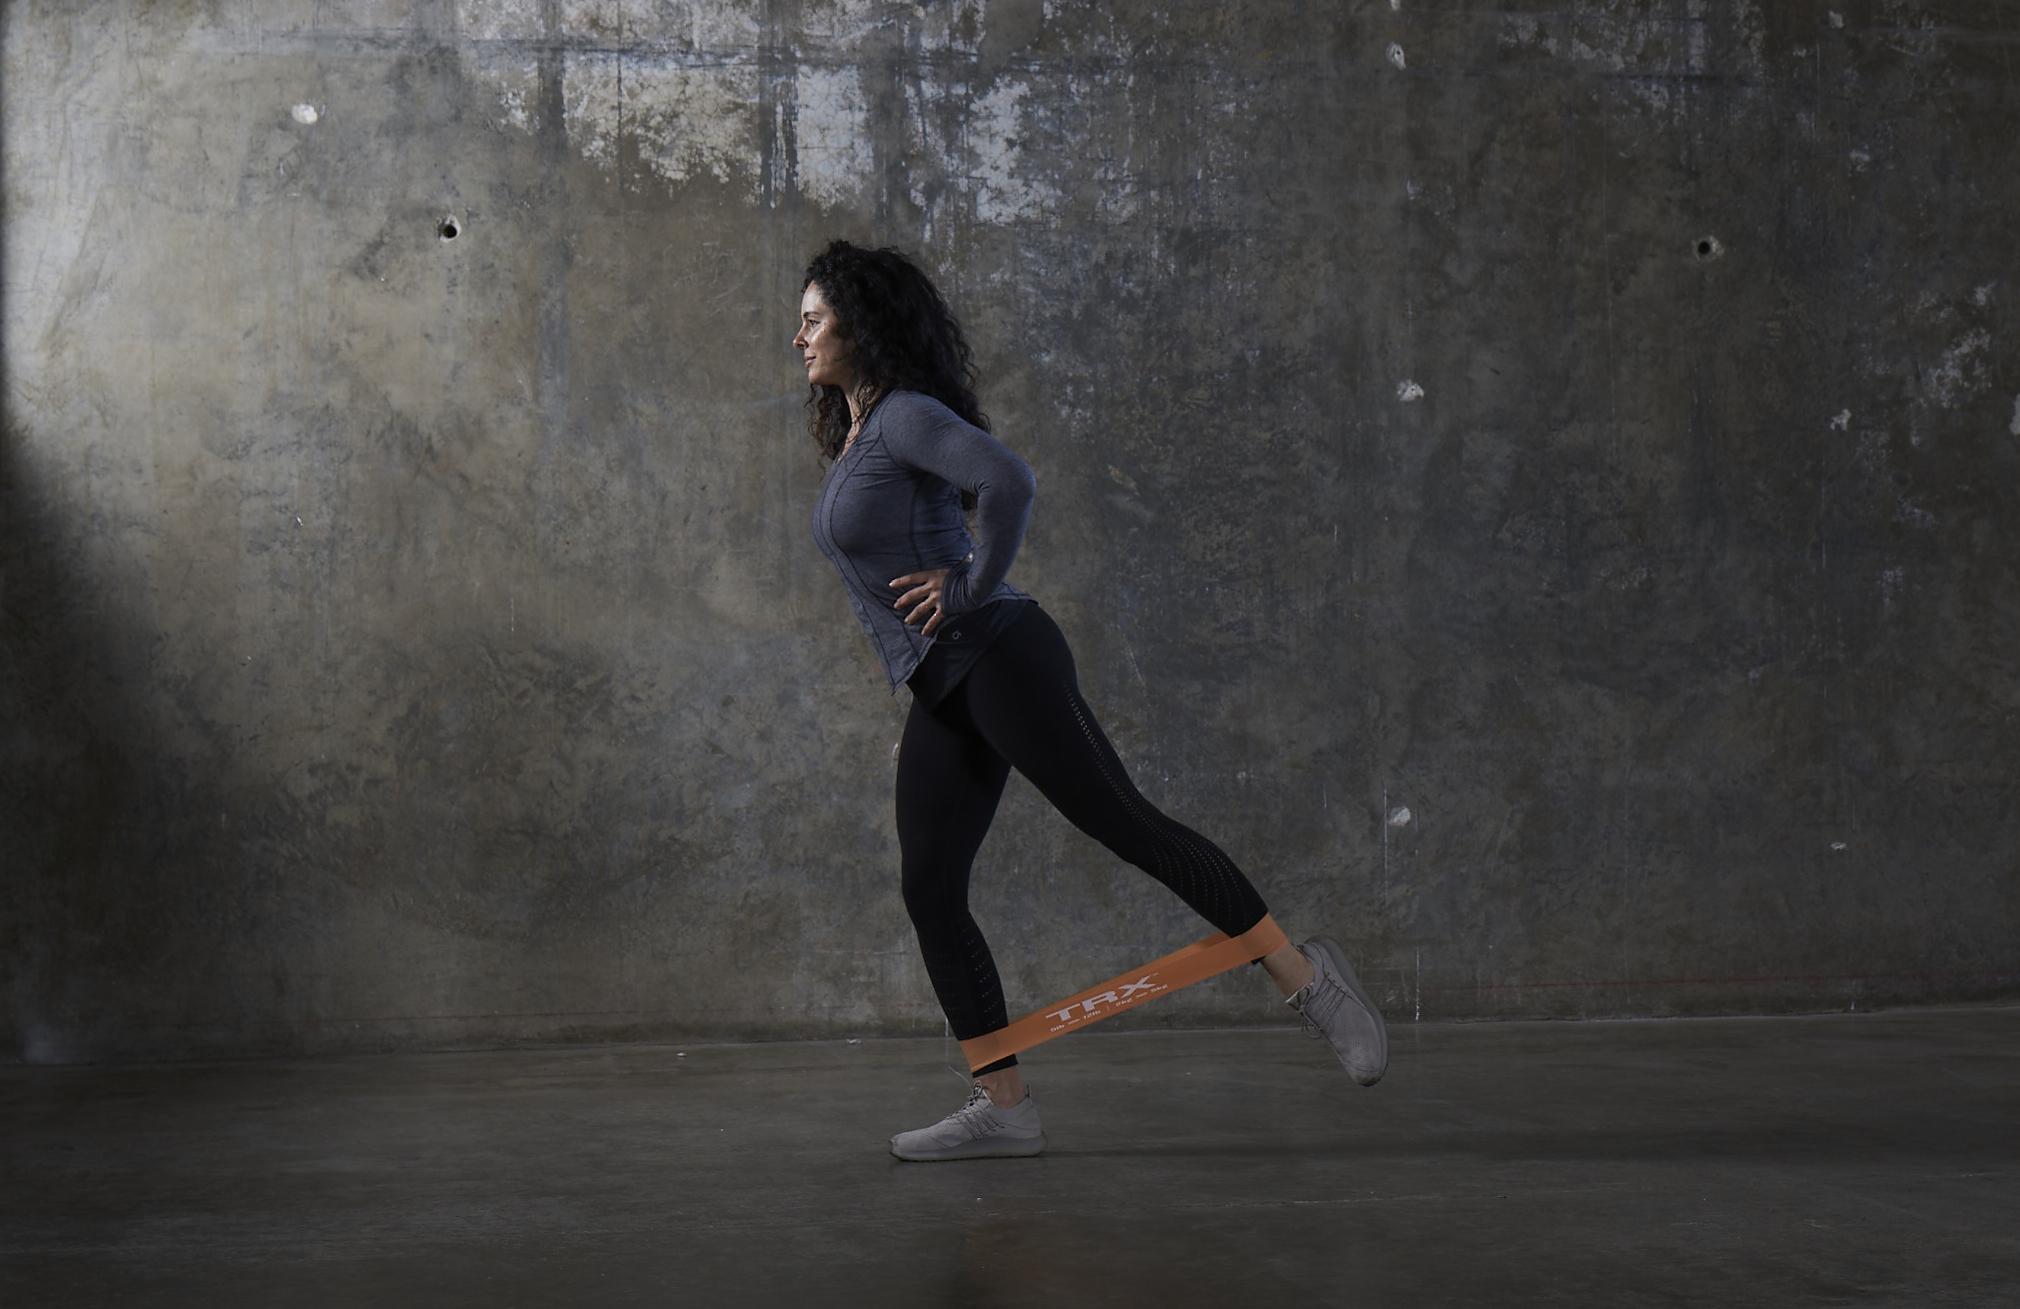 TRX exercise bands in gym grey studio female single leg kick back